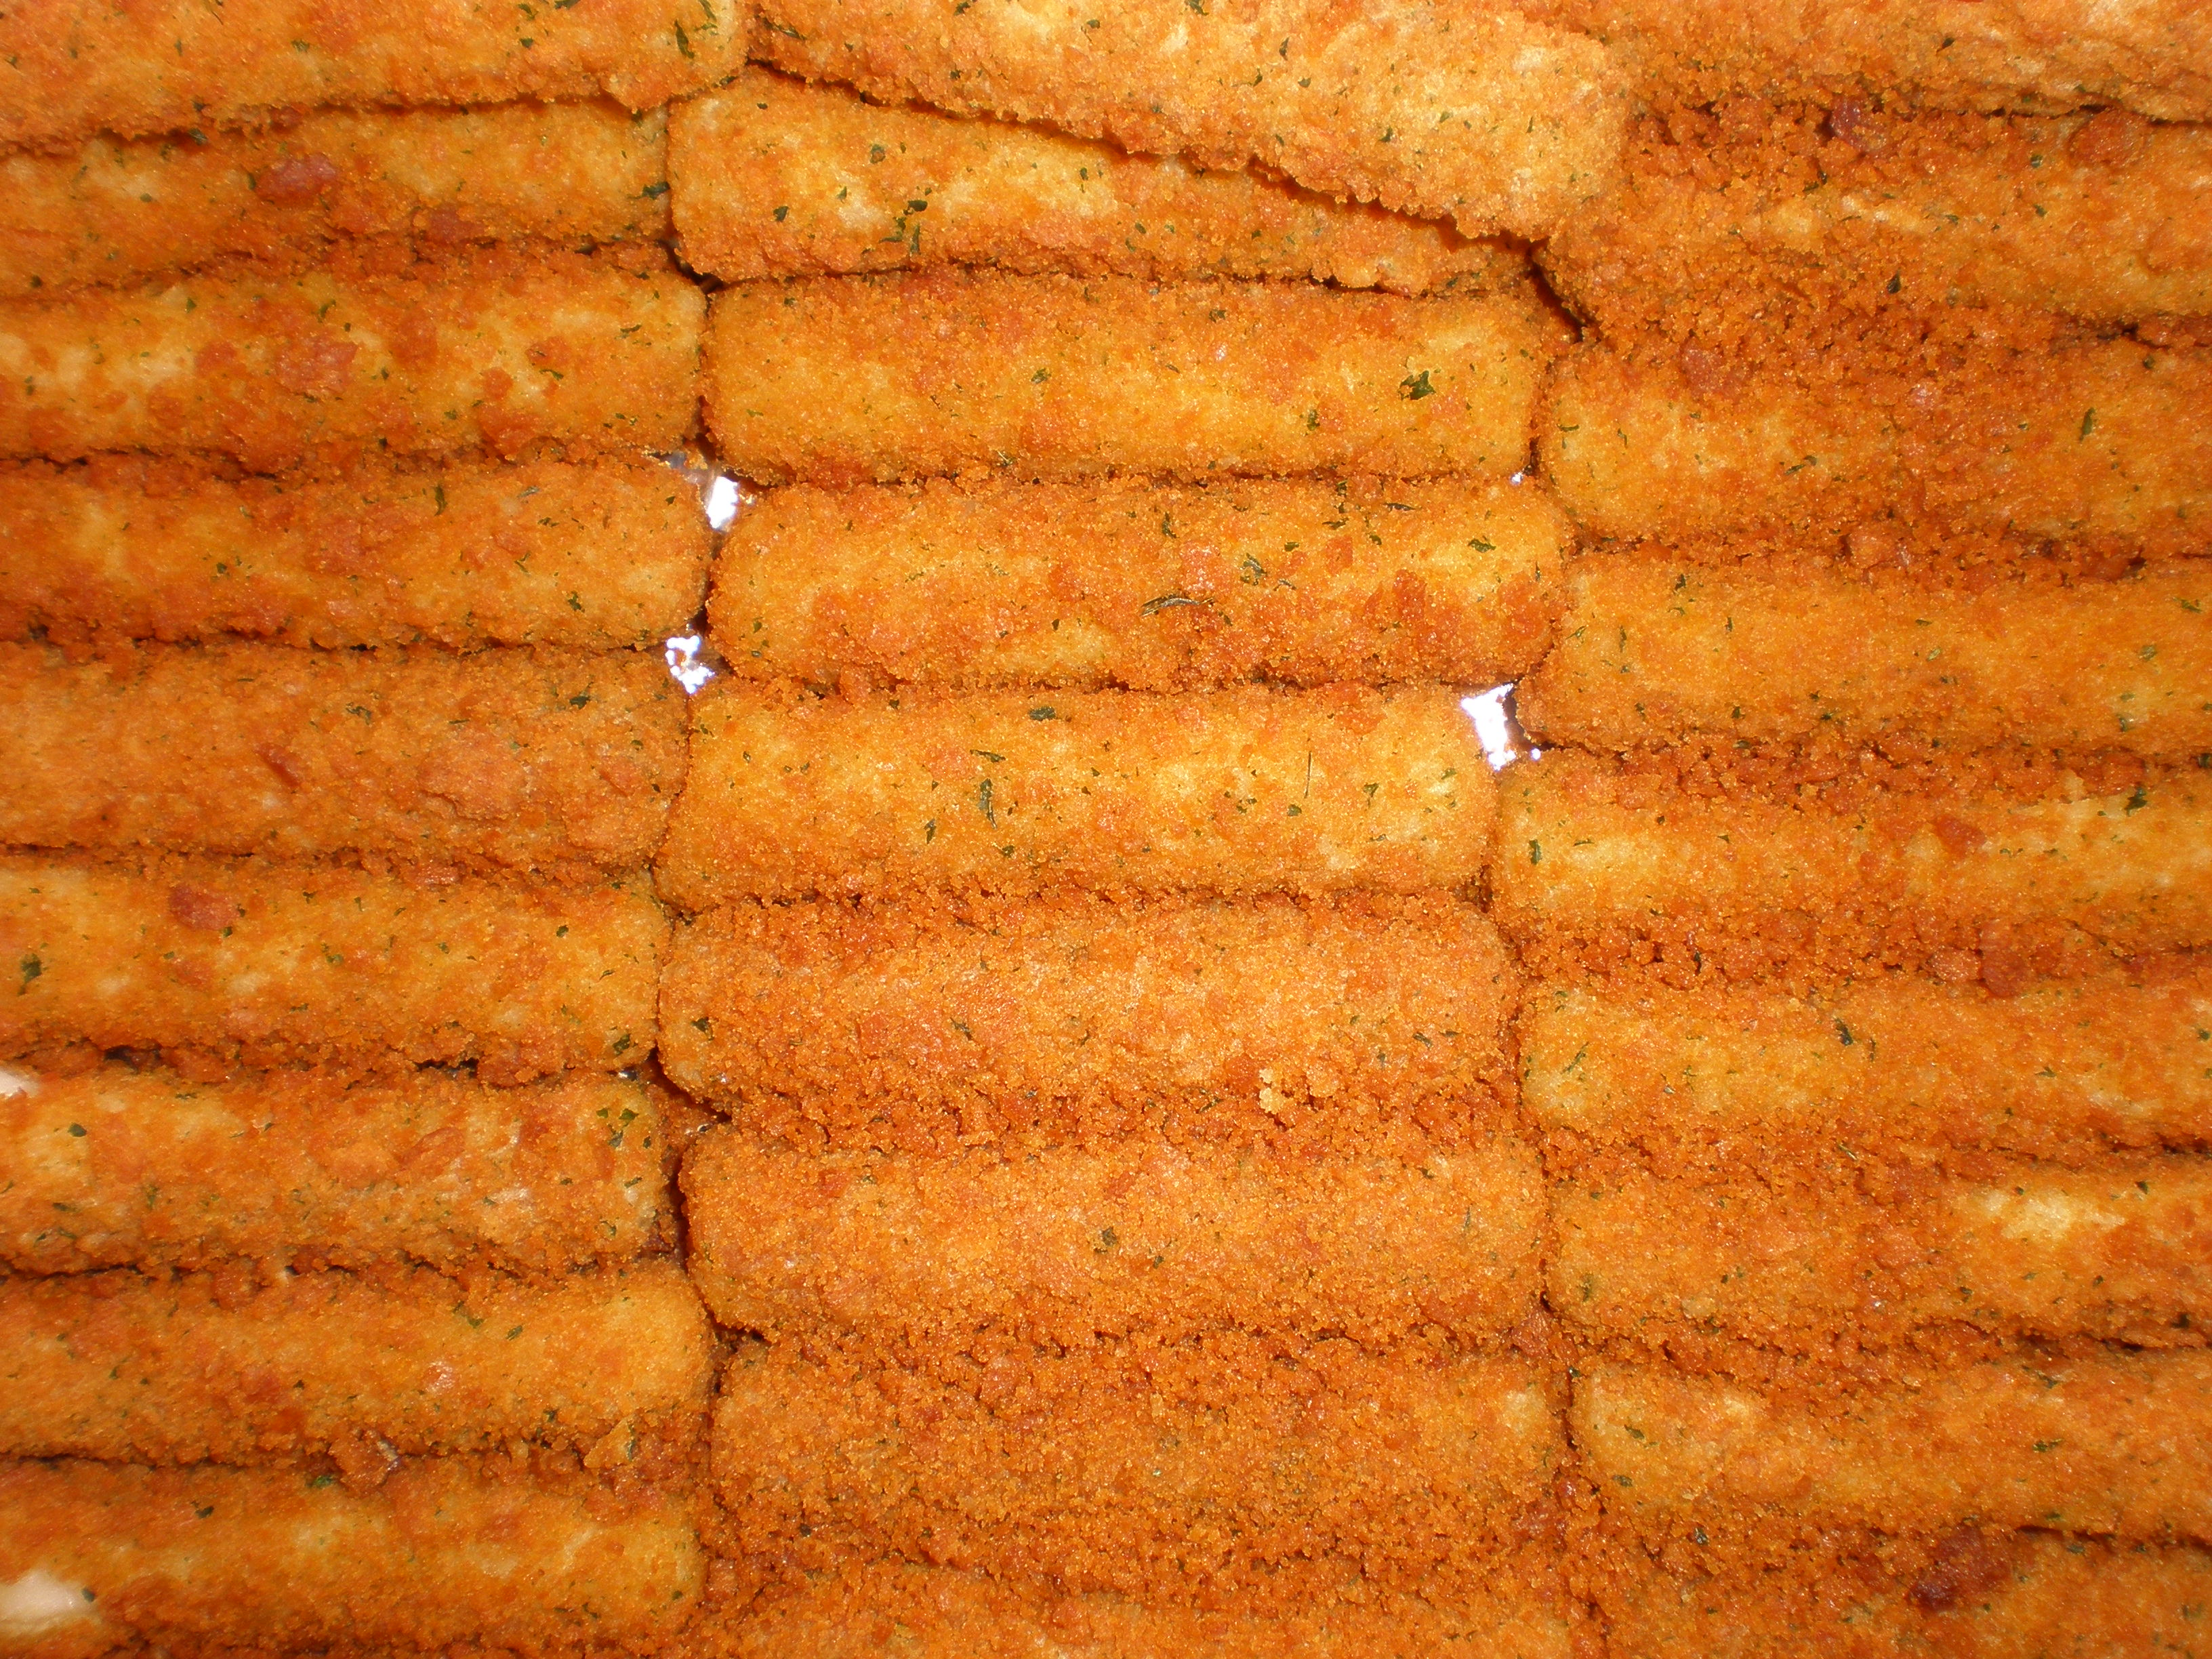 JPG Oven-baked mozzarella sticks